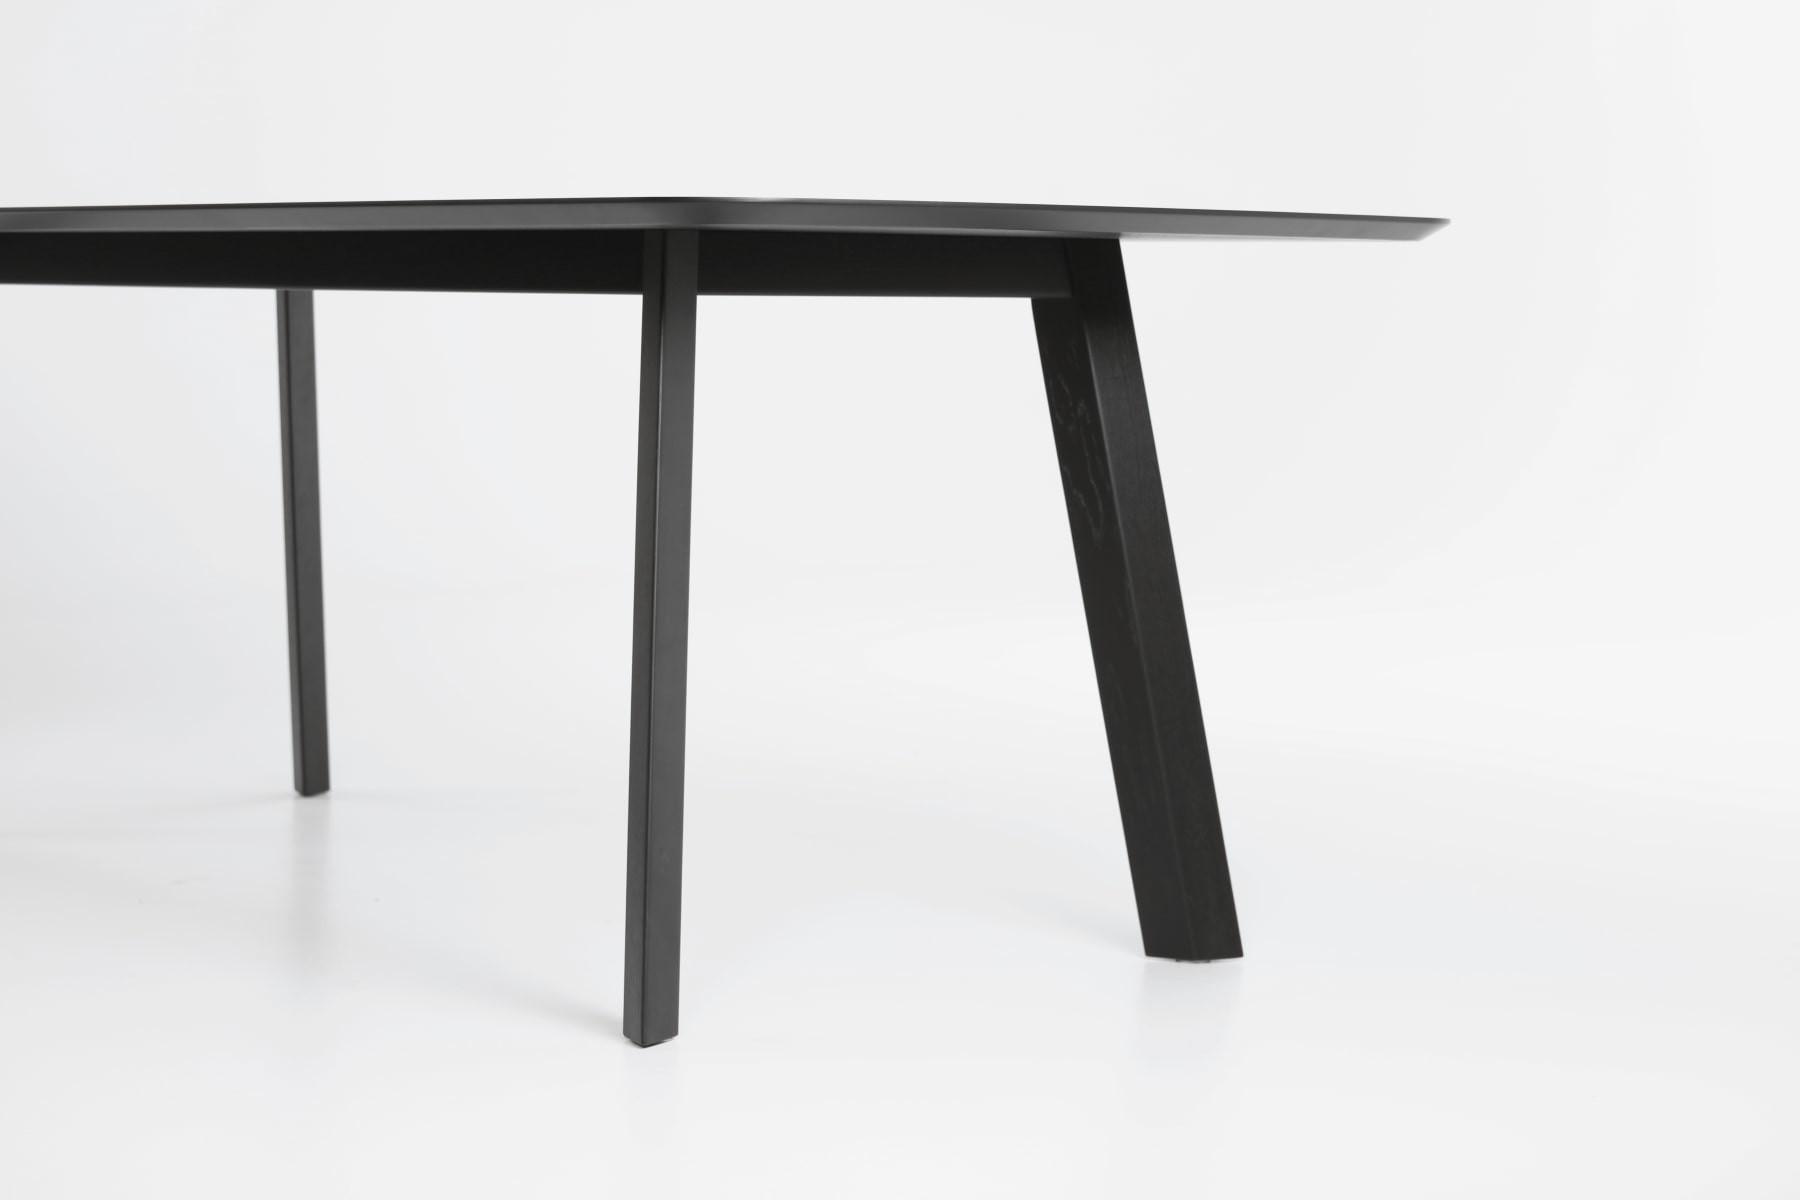 Tisch rohmb prostoria 04